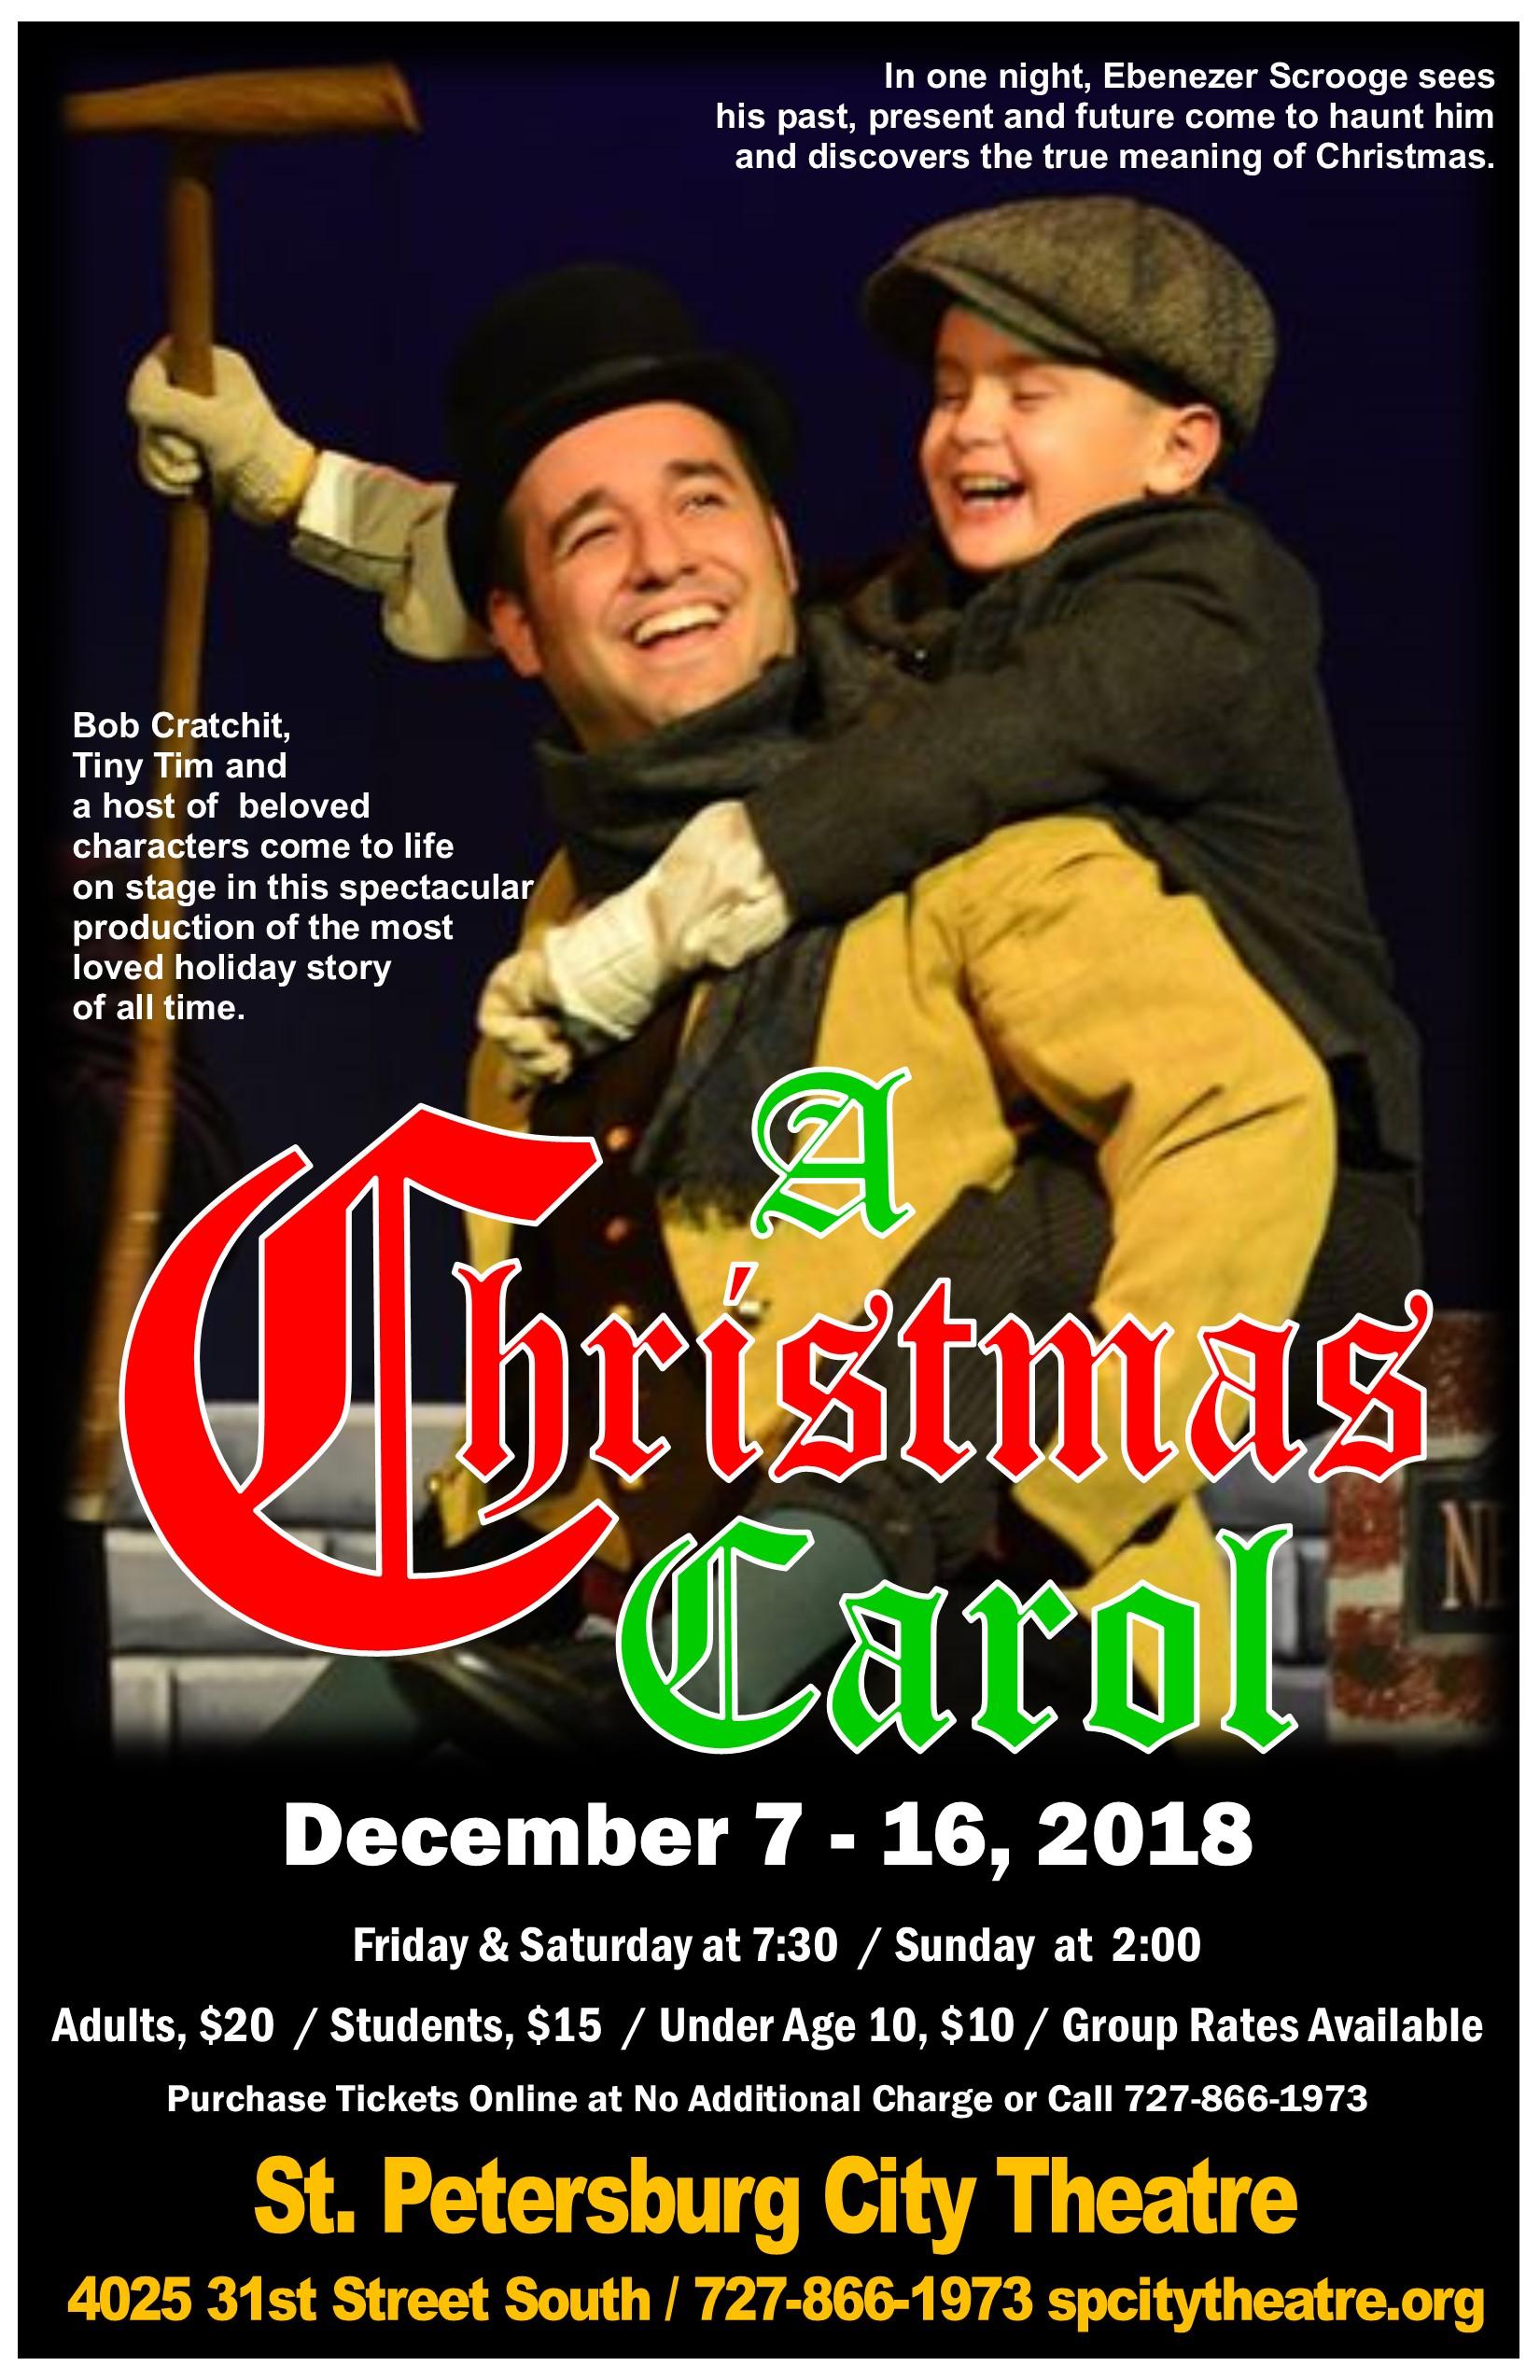 A Christmas Carol Poster.A Christmas Carol Poster 2018 St Petersburg City Theatre